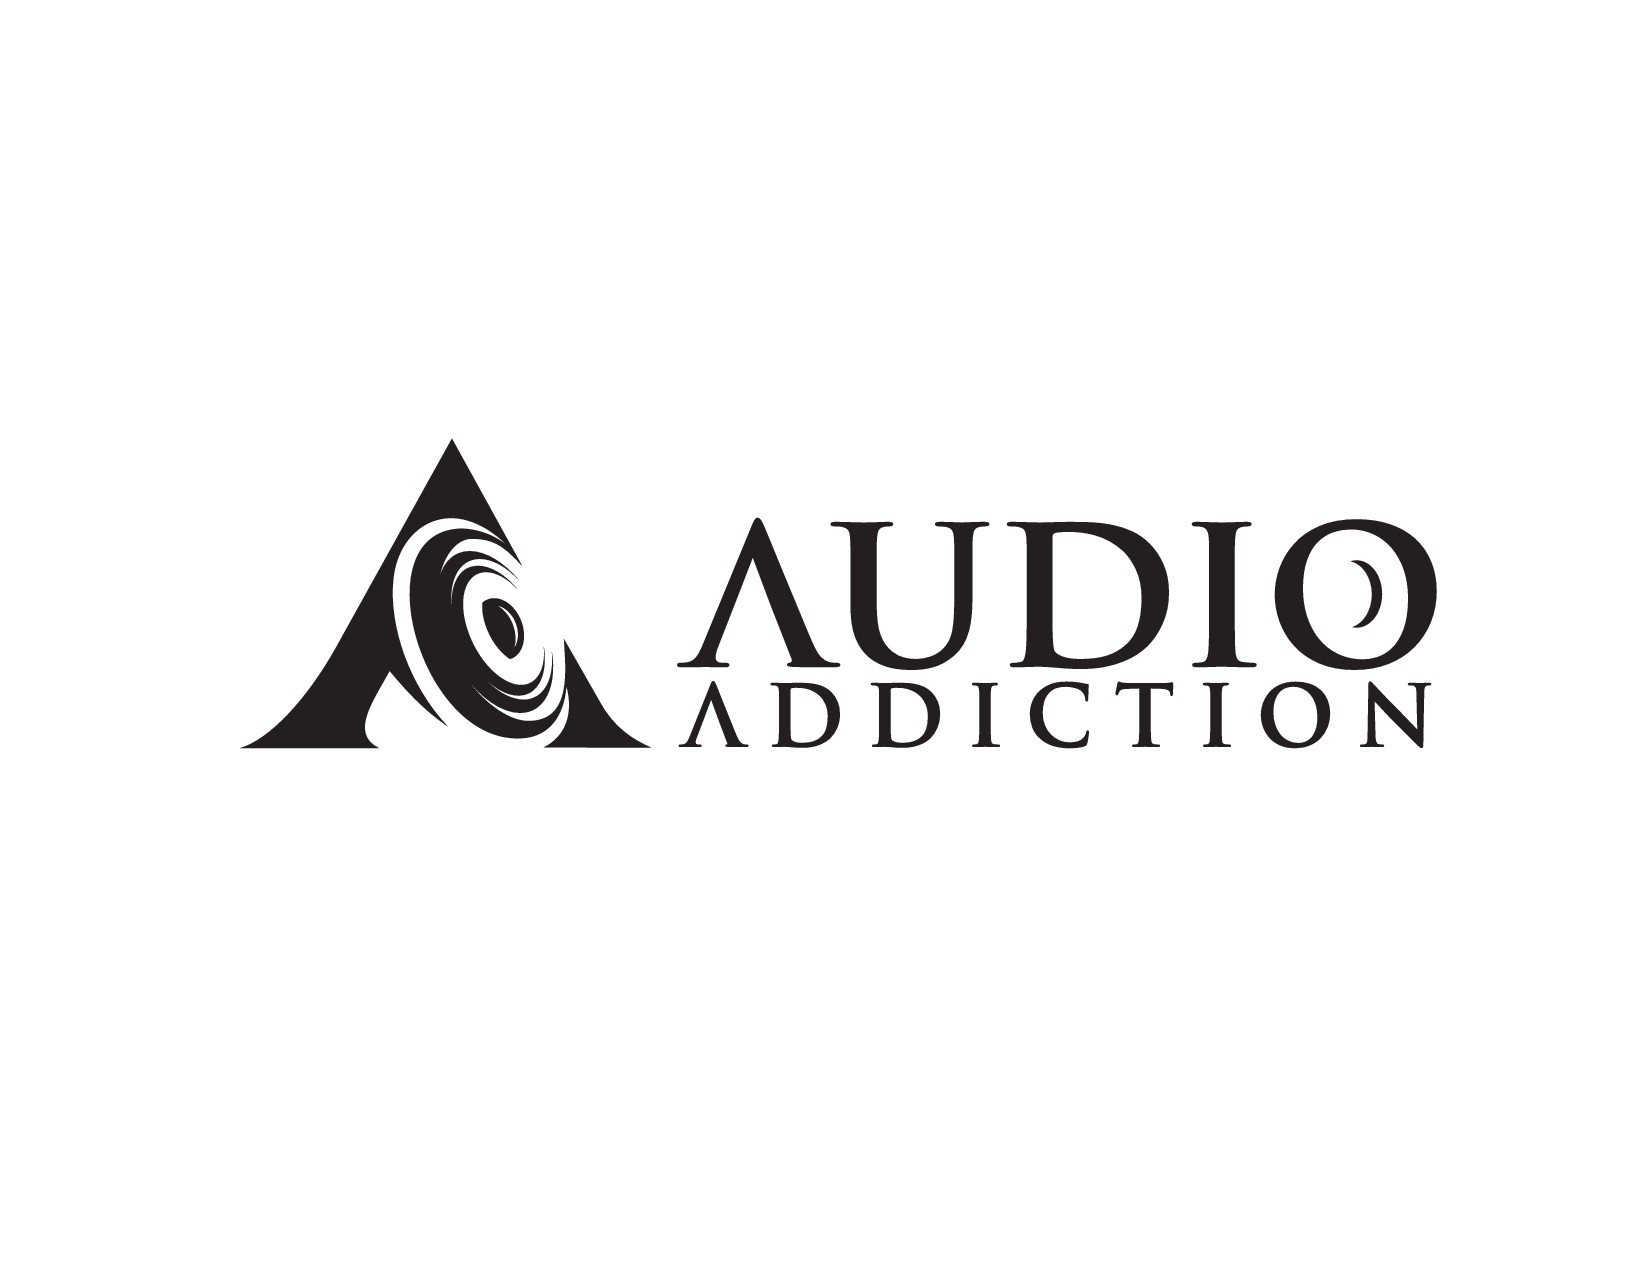 Logo for Audio Addiction